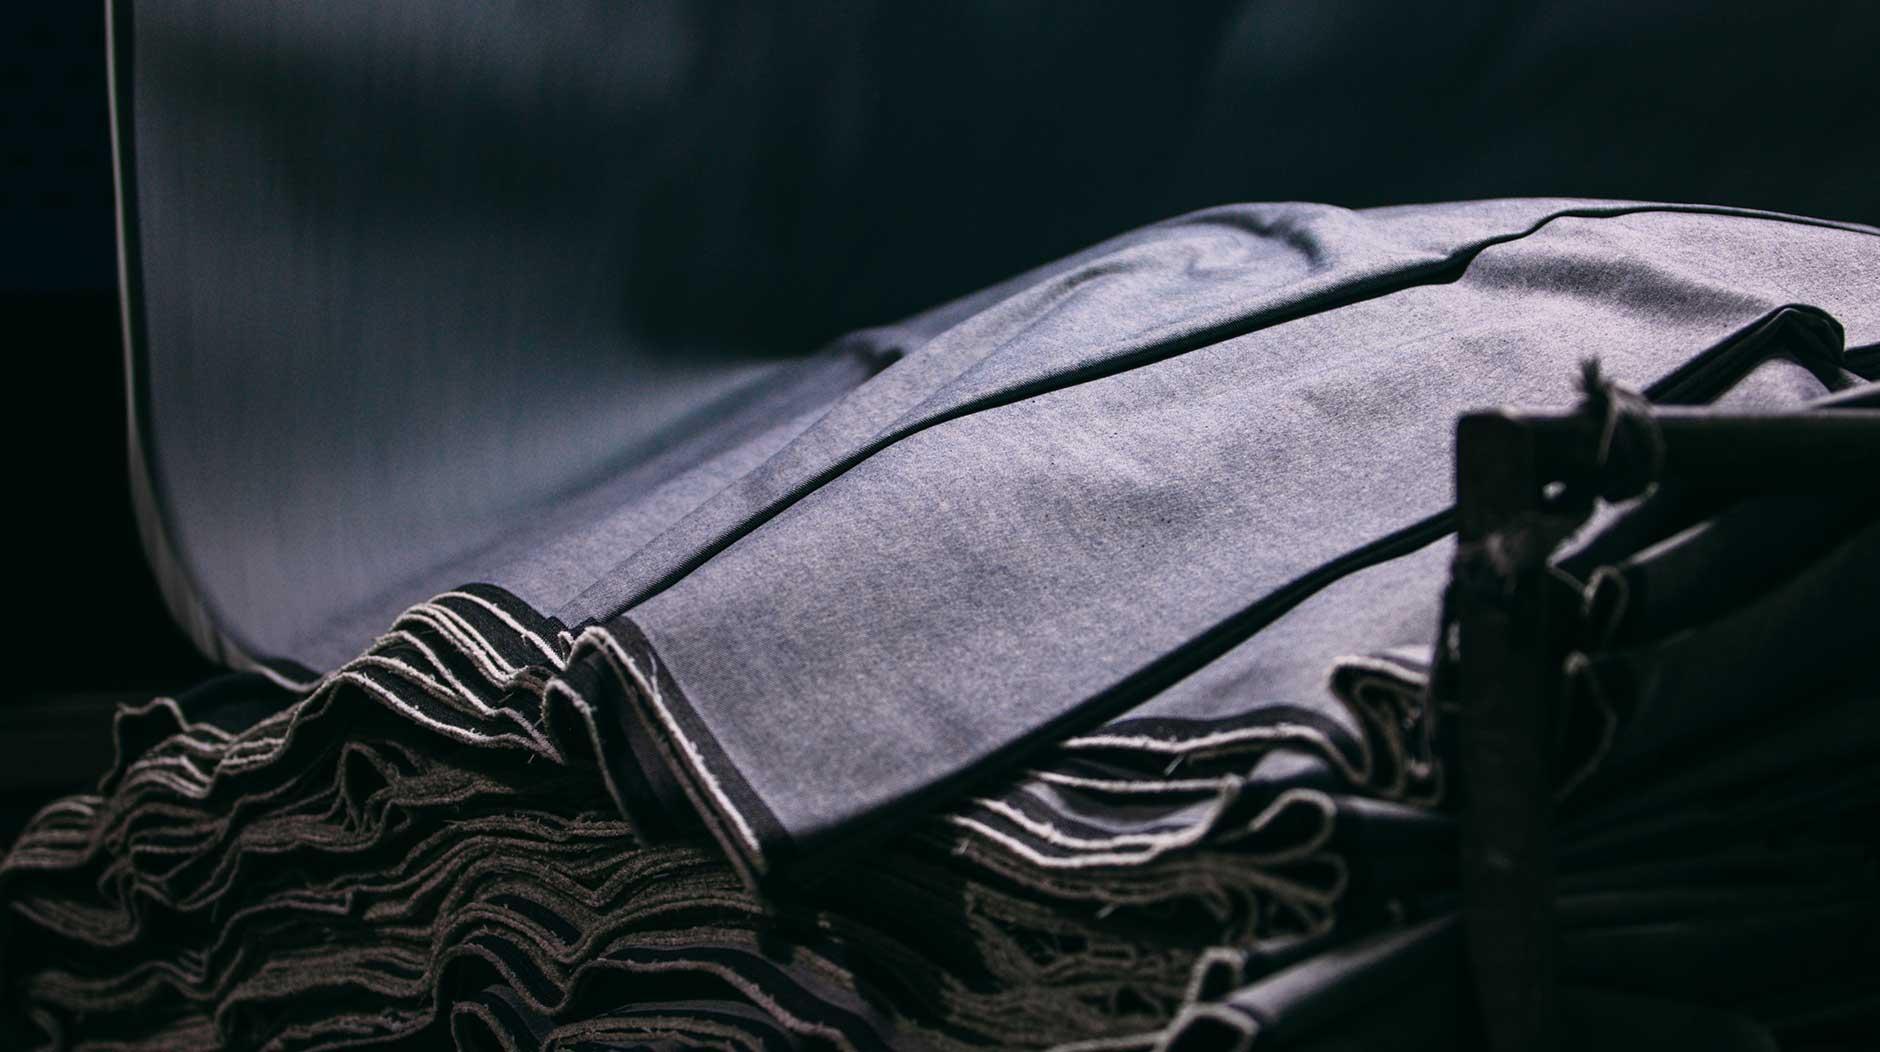 Layers of denim fabric